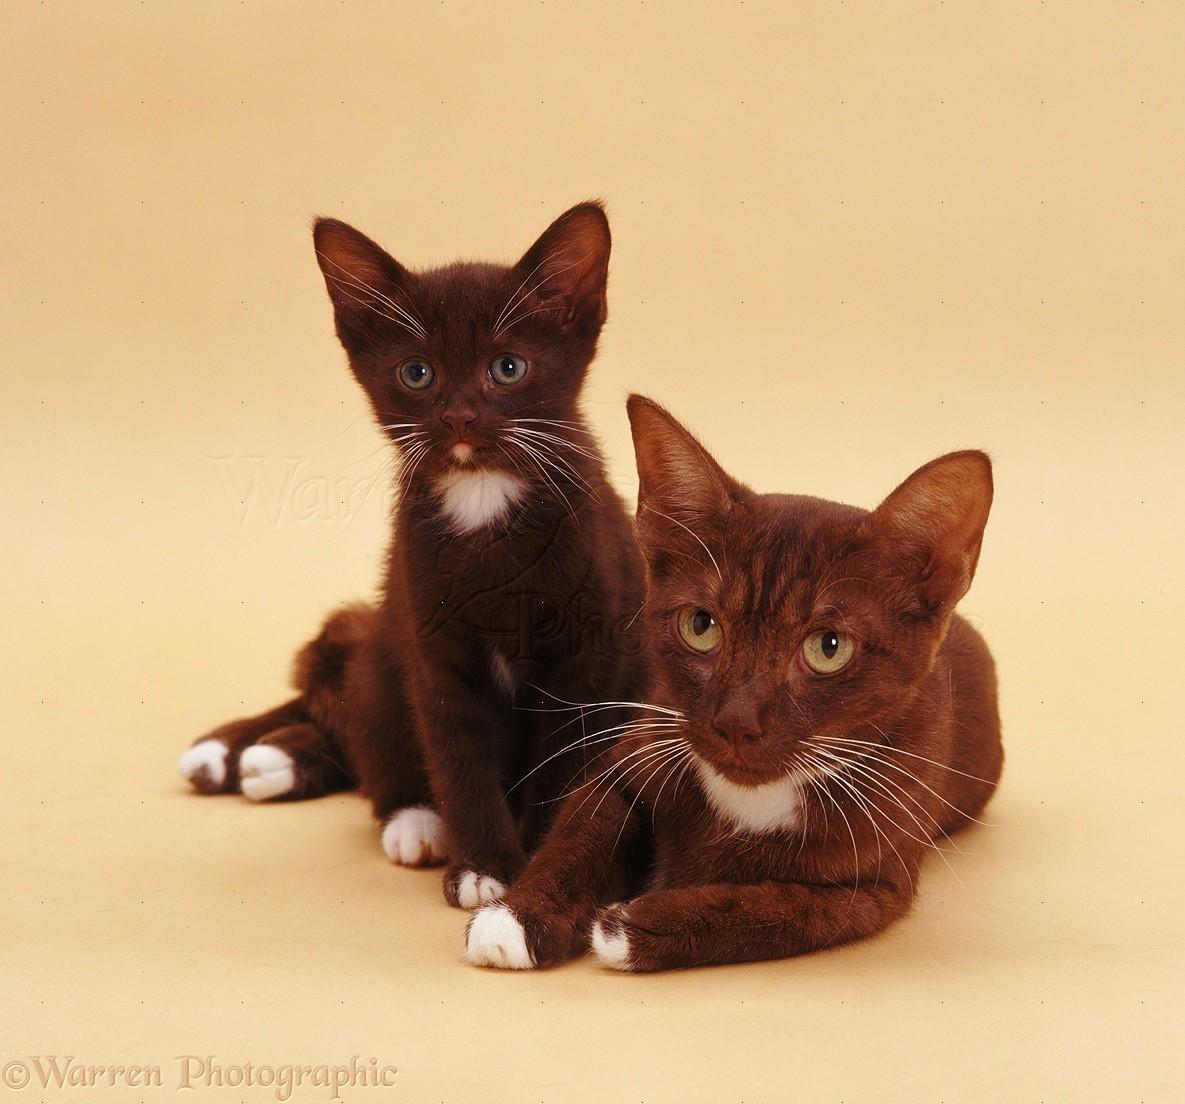 Chocolate-and-white cat and kitten photo - WP07436